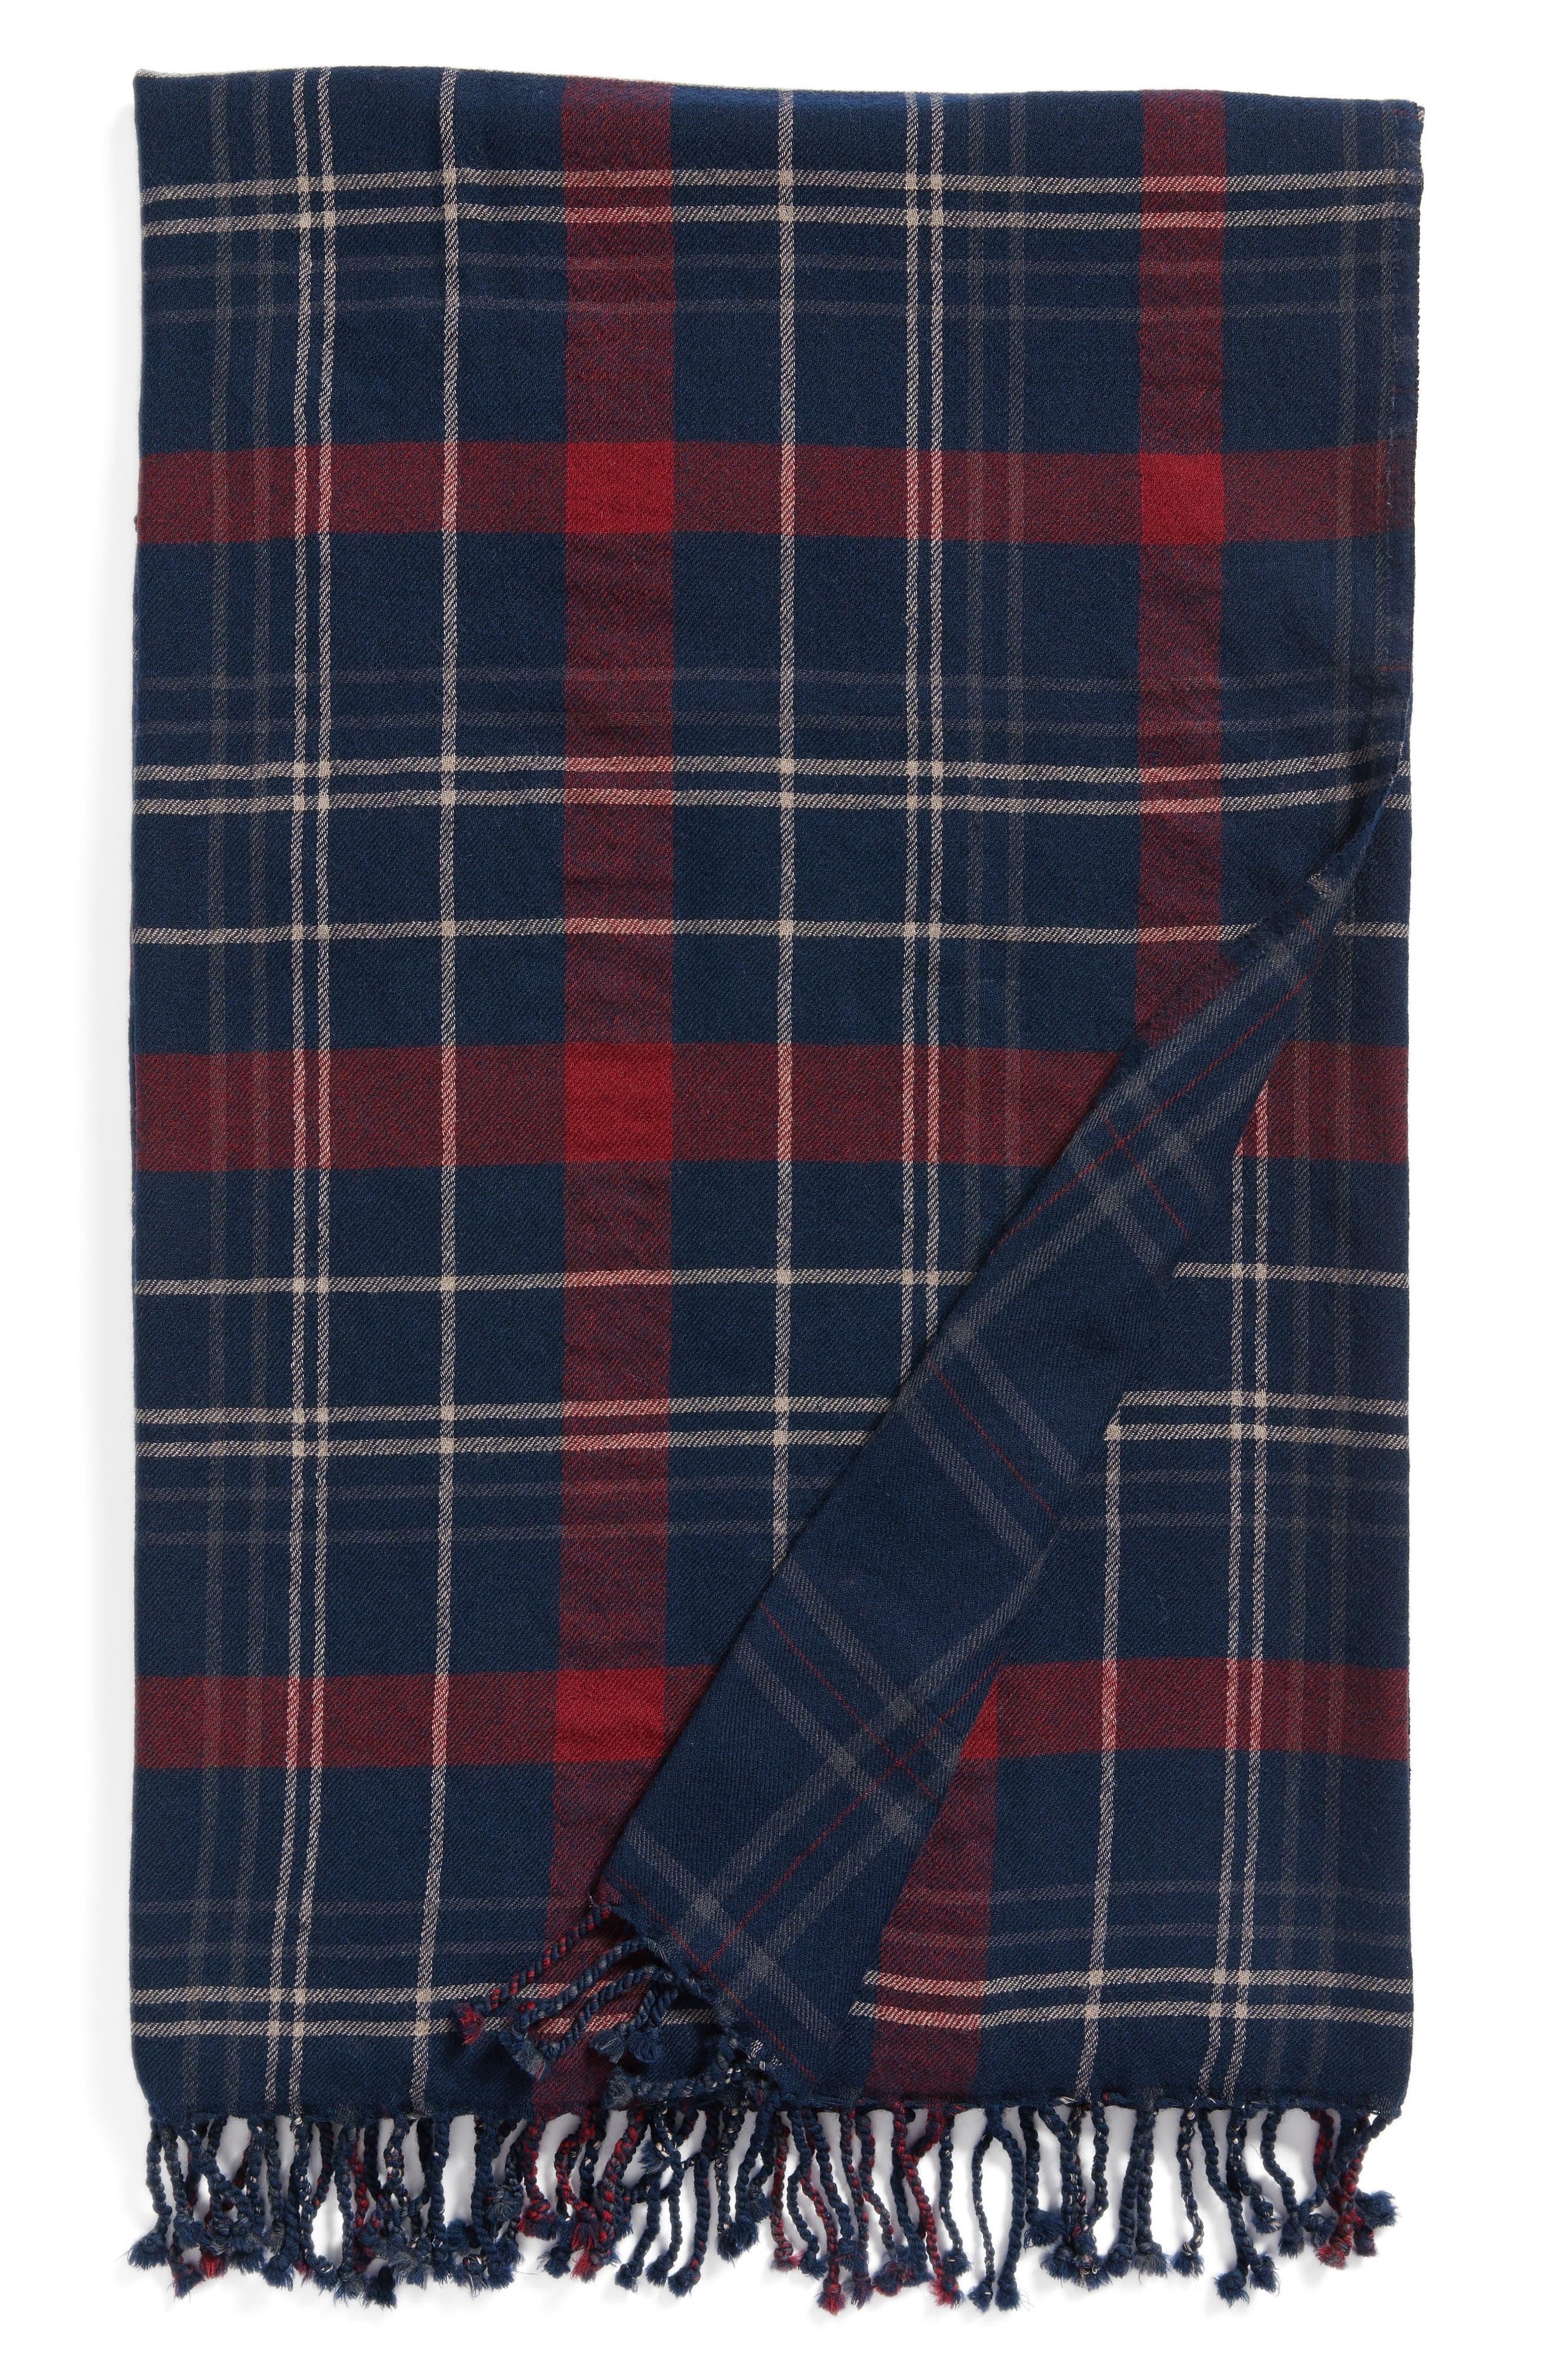 Main Image - Modern Staples Tartan Double Face Merino Wool Throw